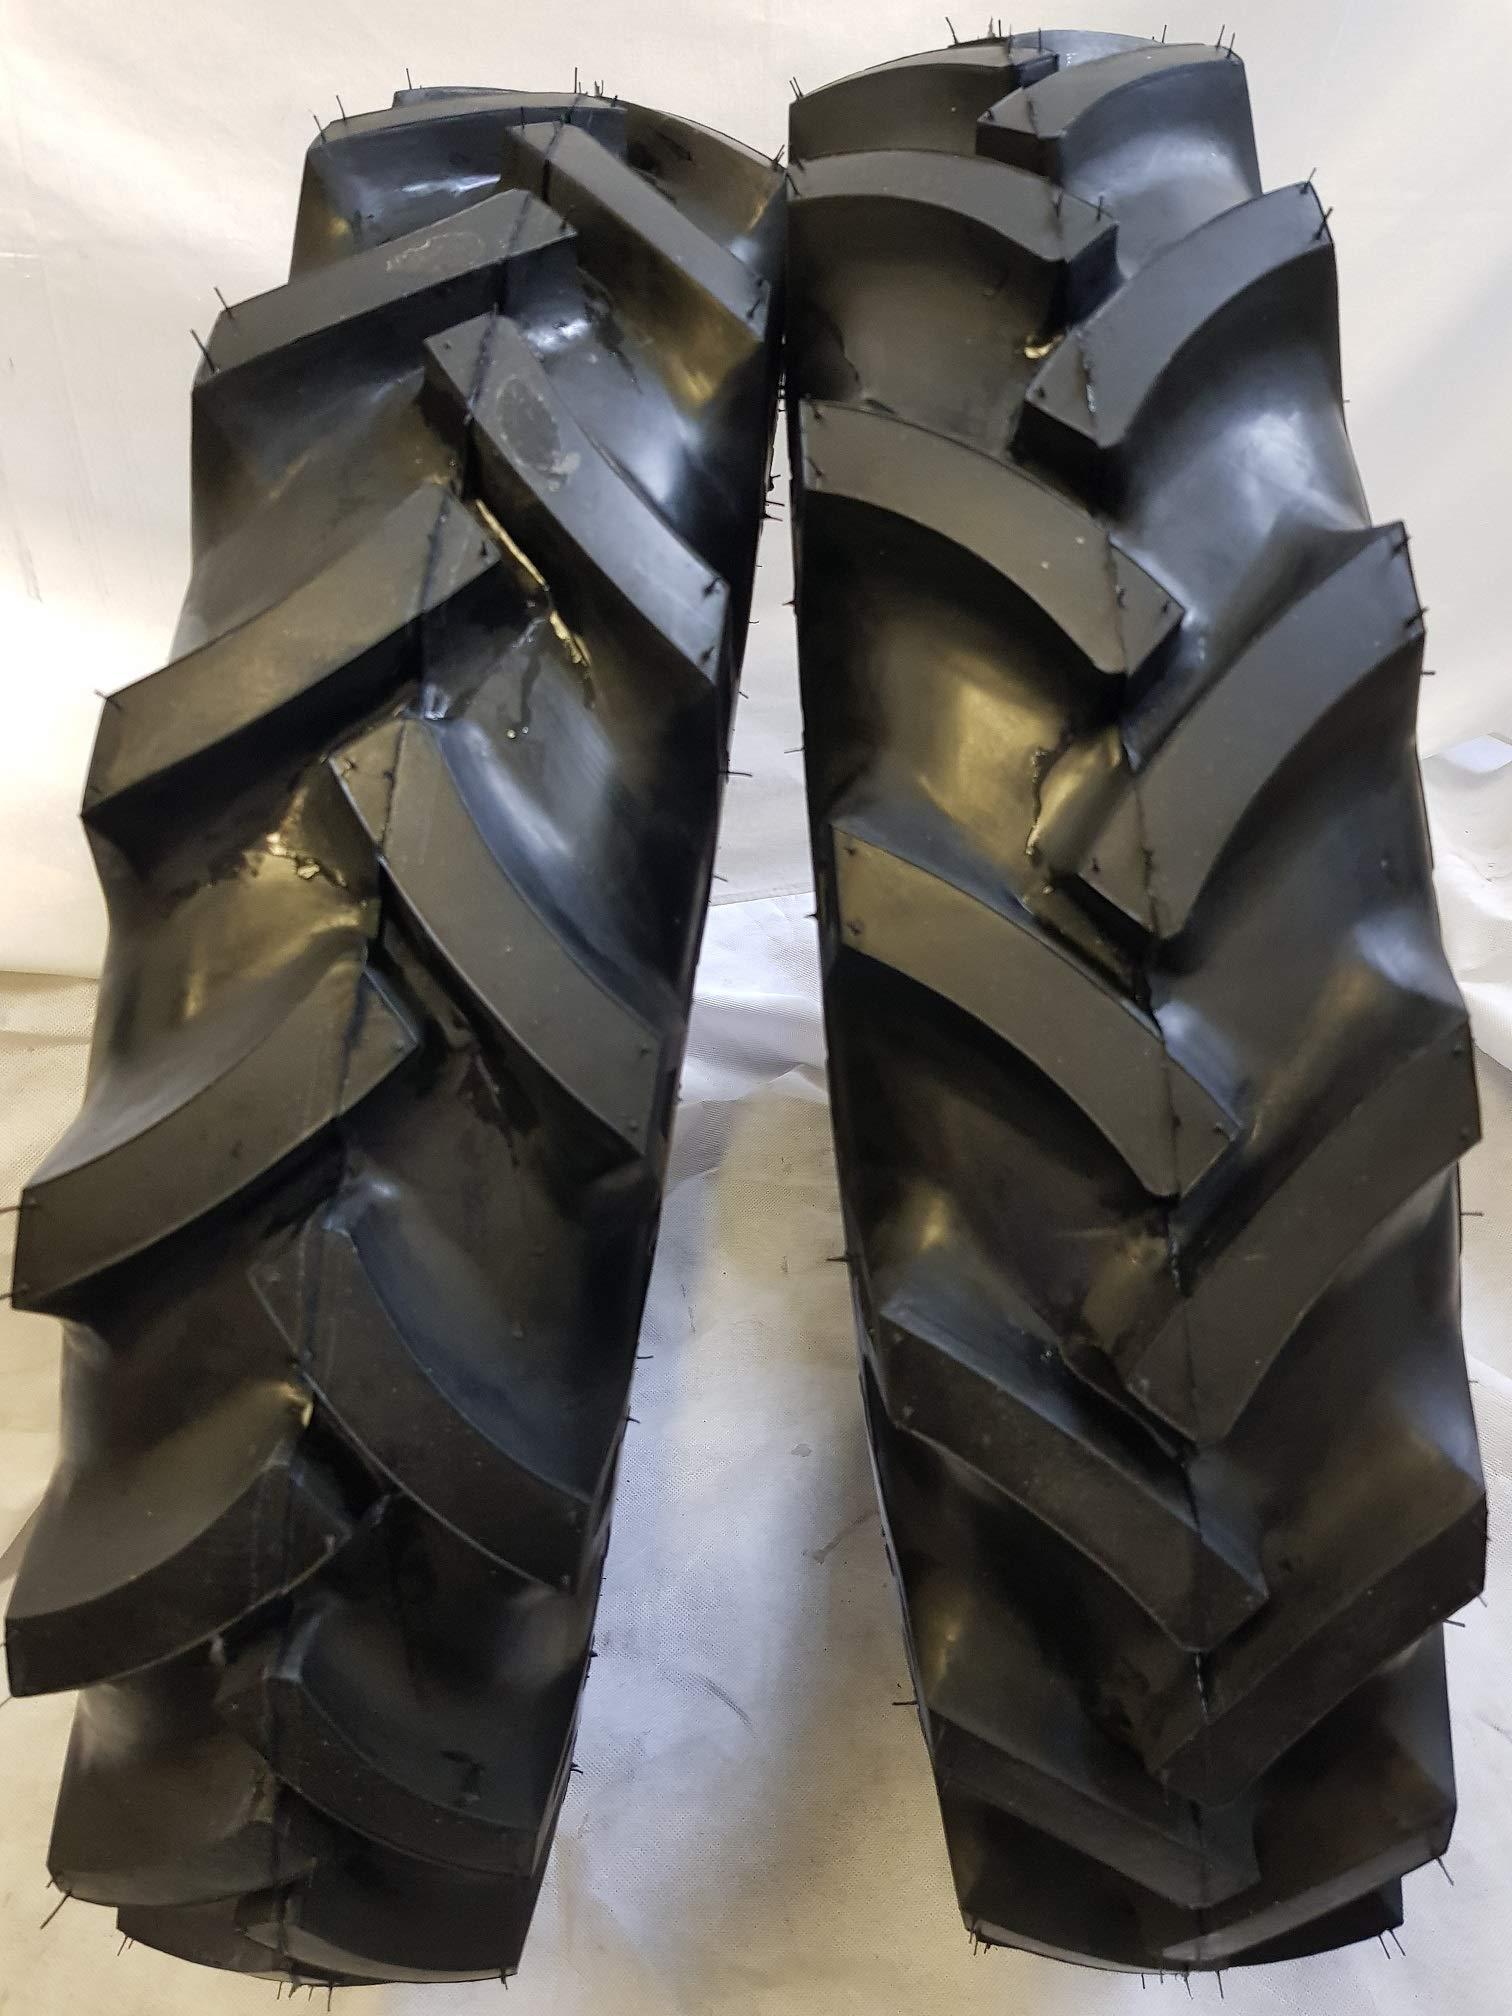 (2 TIRES + 2 TUBES) 6.50-16 6 PLY ROAD WARRIOR KNK50 R1 3-Rib Farm Tractor Tires 6.50x16